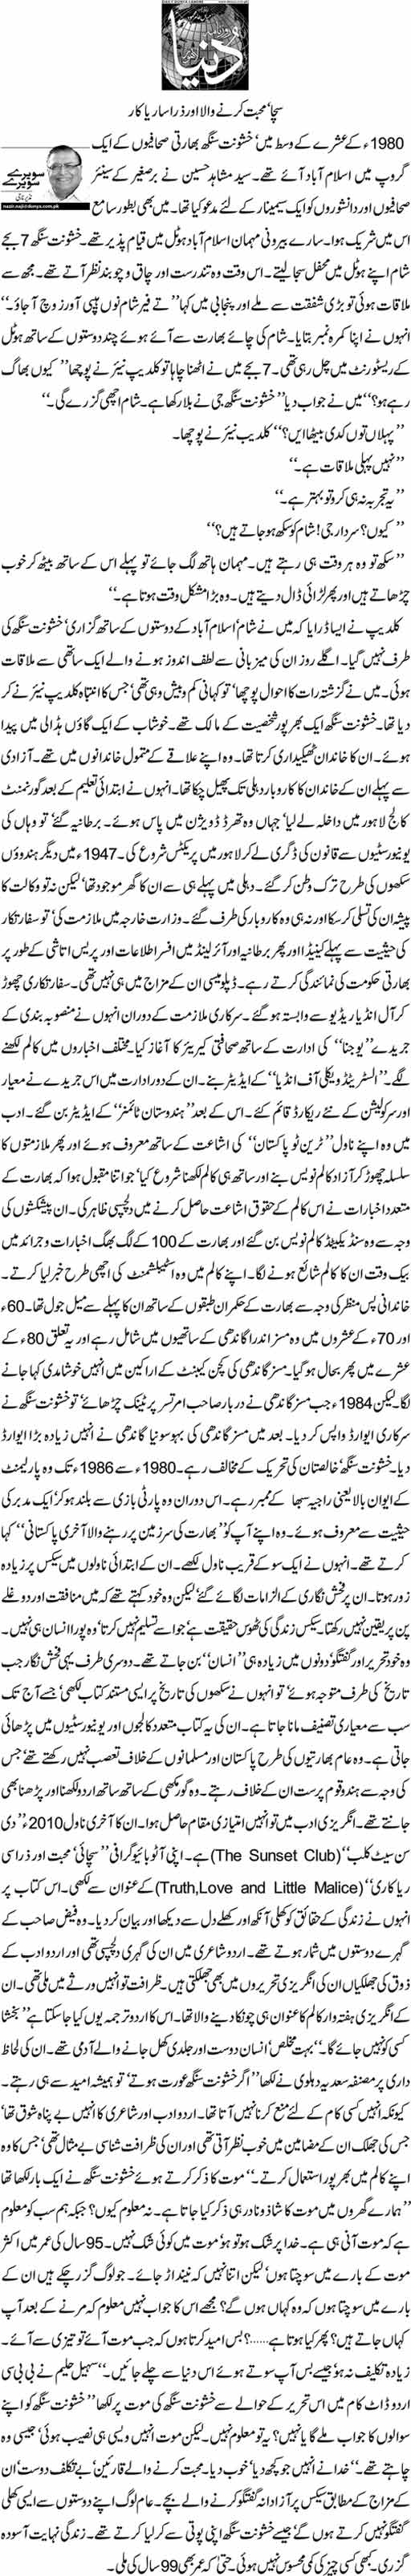 Sacha, Muhabbat Karnay Wala Aur Zara Sa Riyakaar - Nazeer Naji